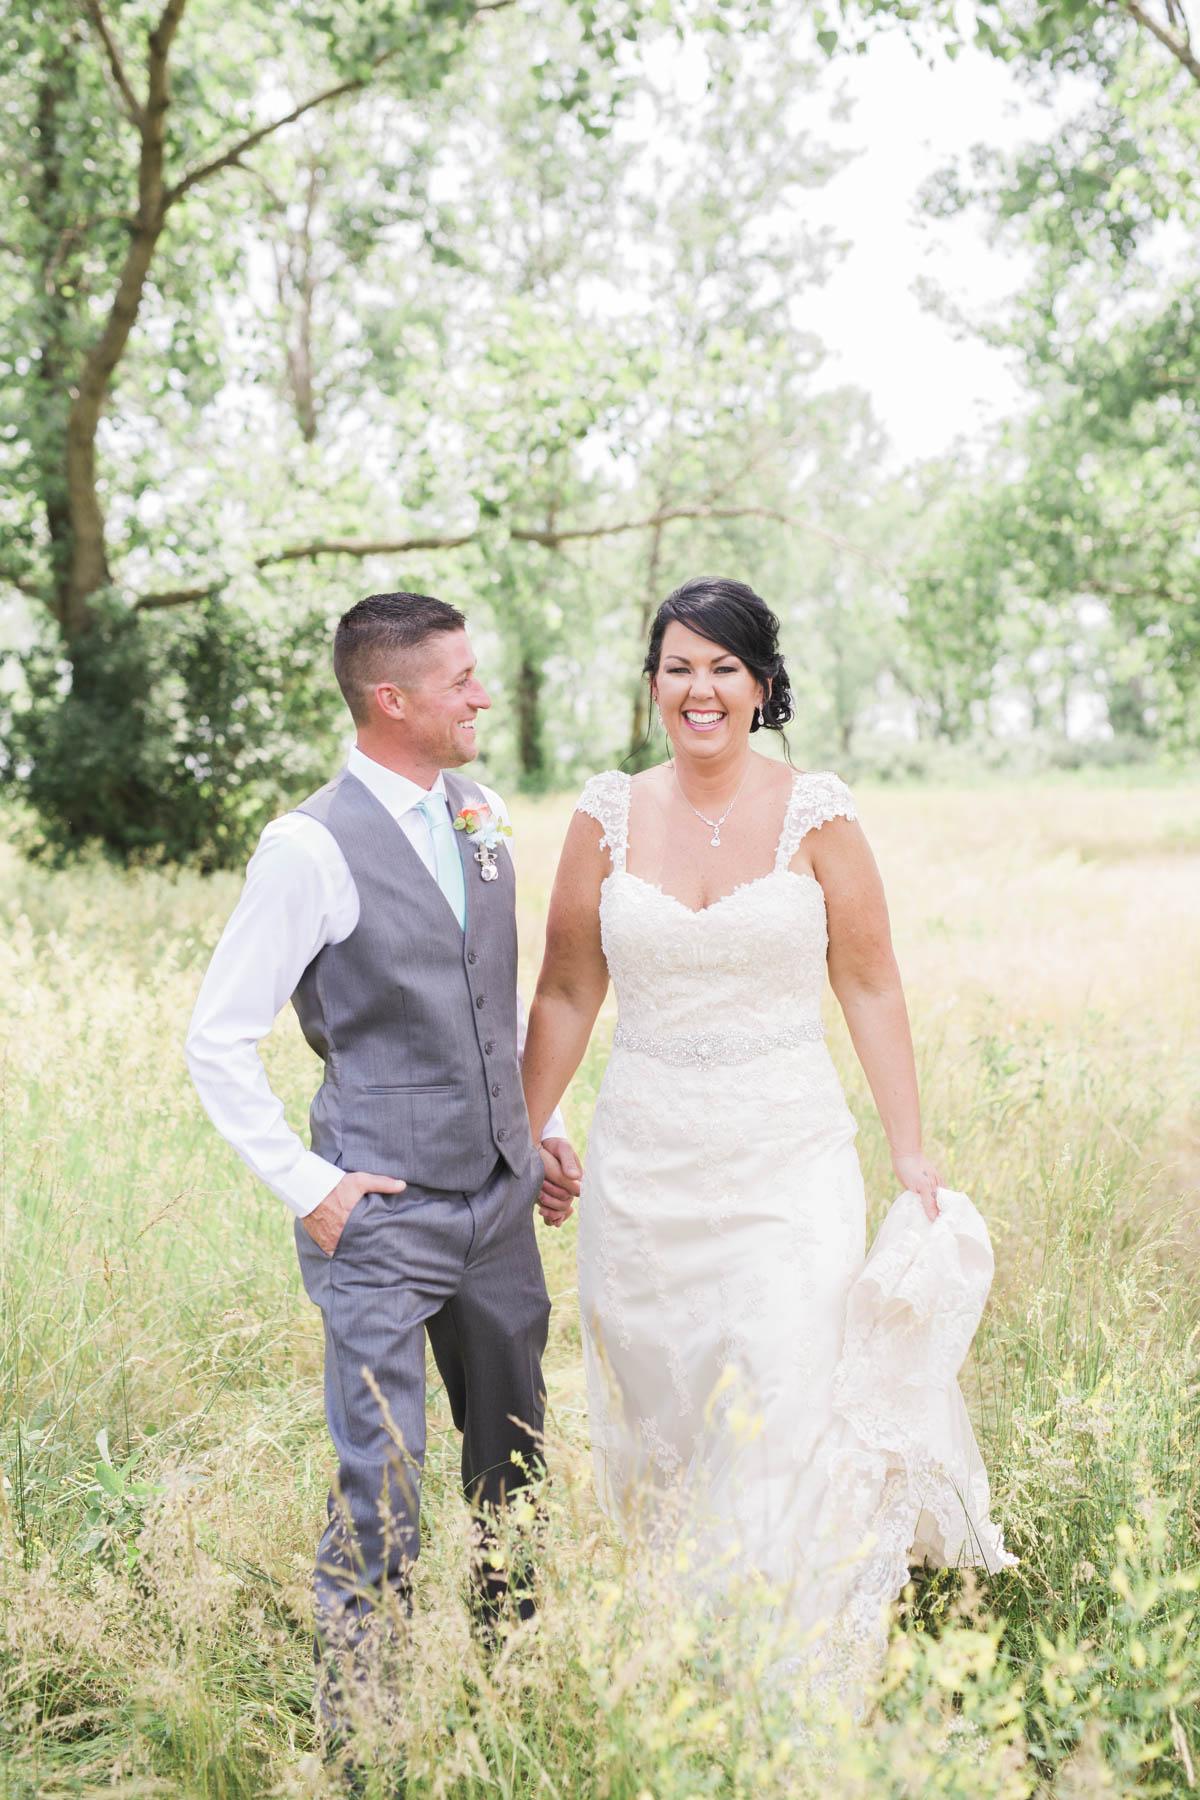 shotbychelsea_wedding_photography_blog-6.jpg